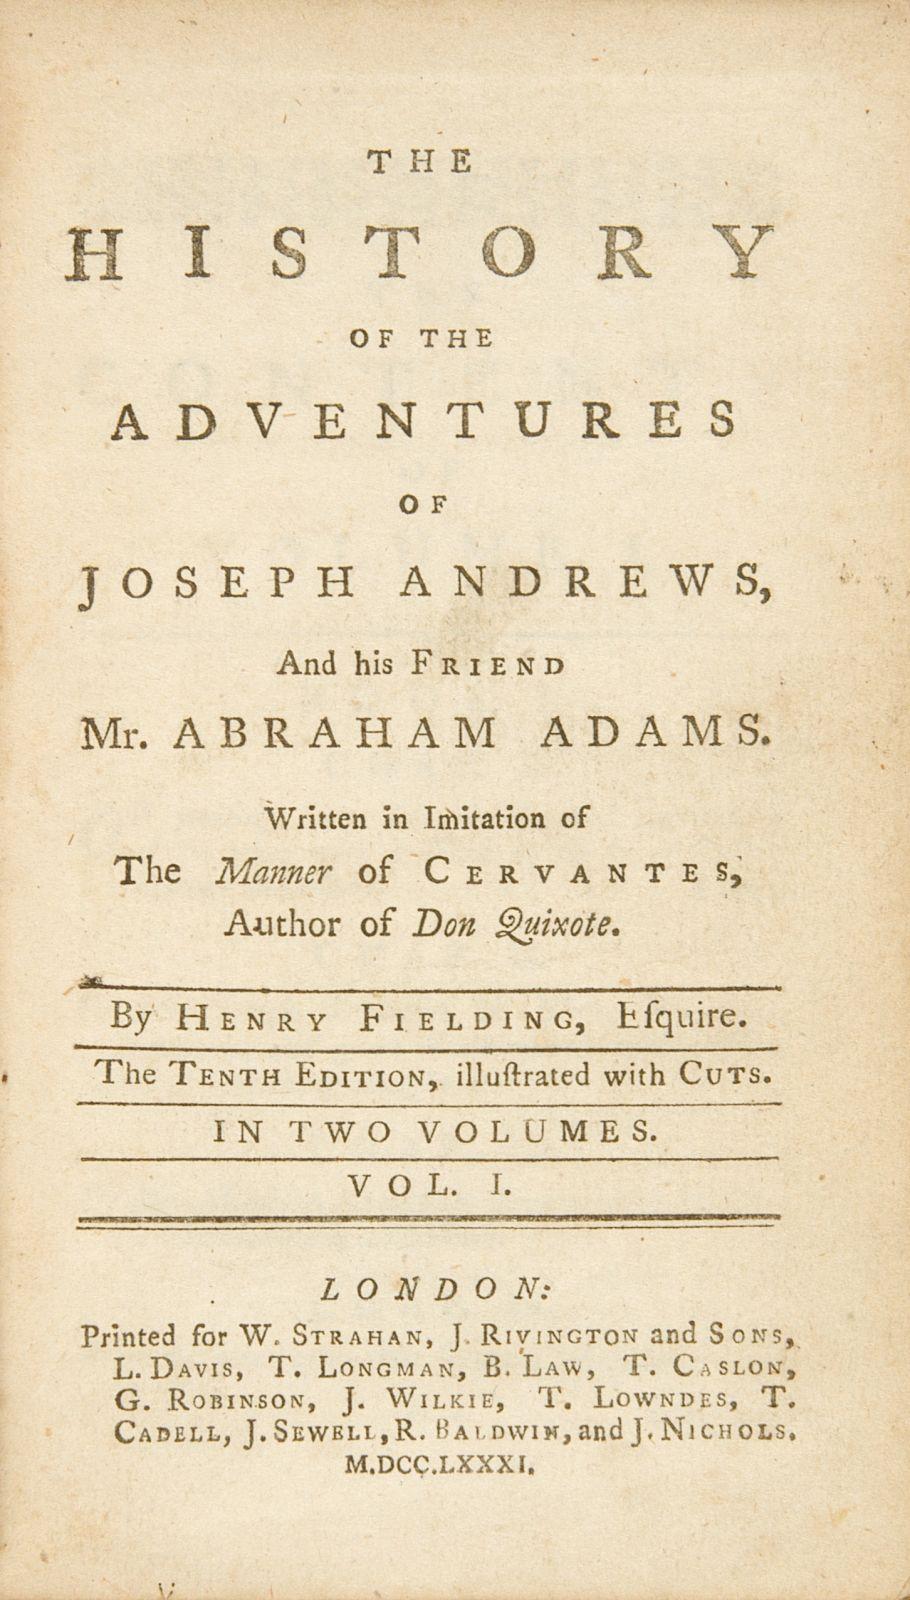 1781-London-Strahan-01-000-t.jpg